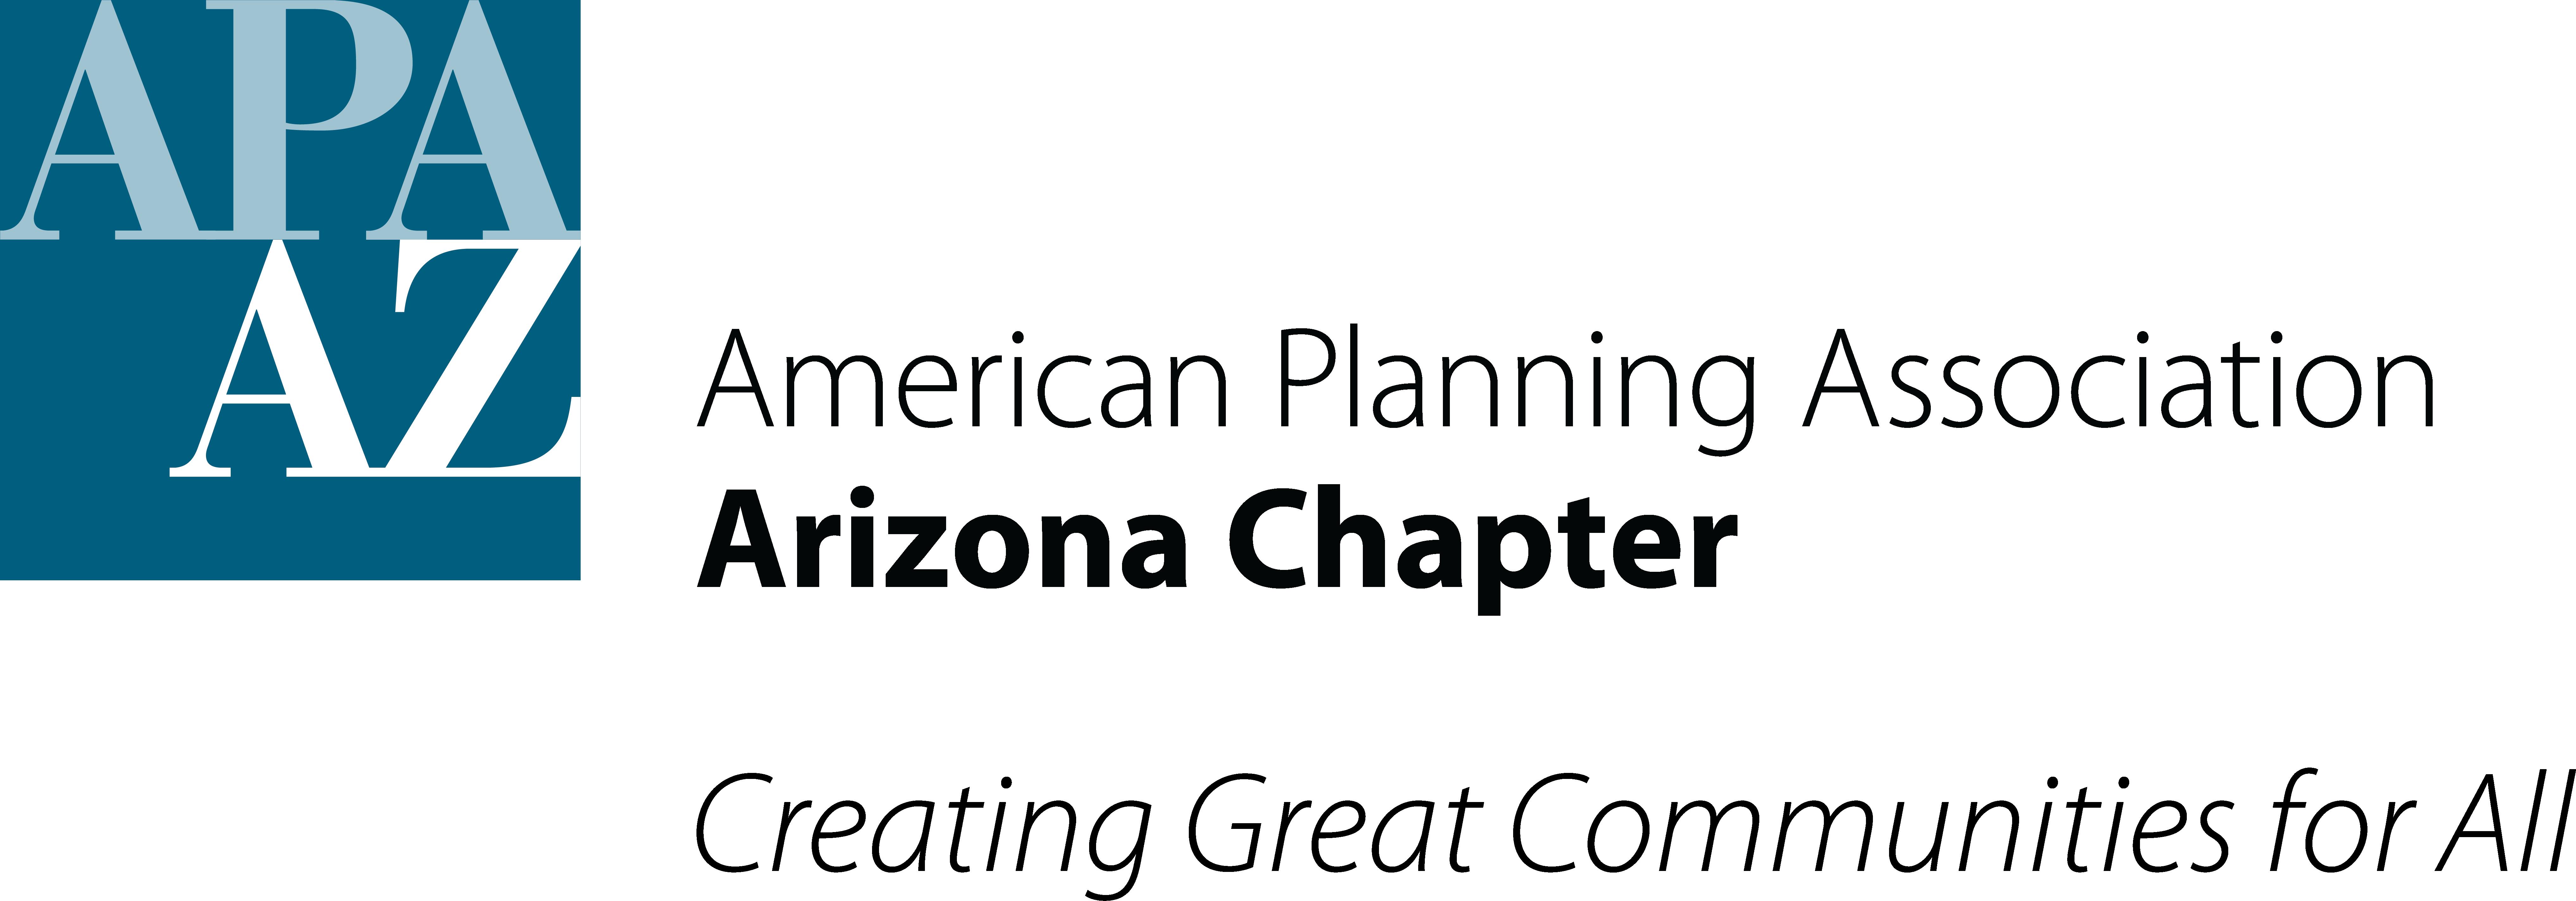 APA Arizona Chapter